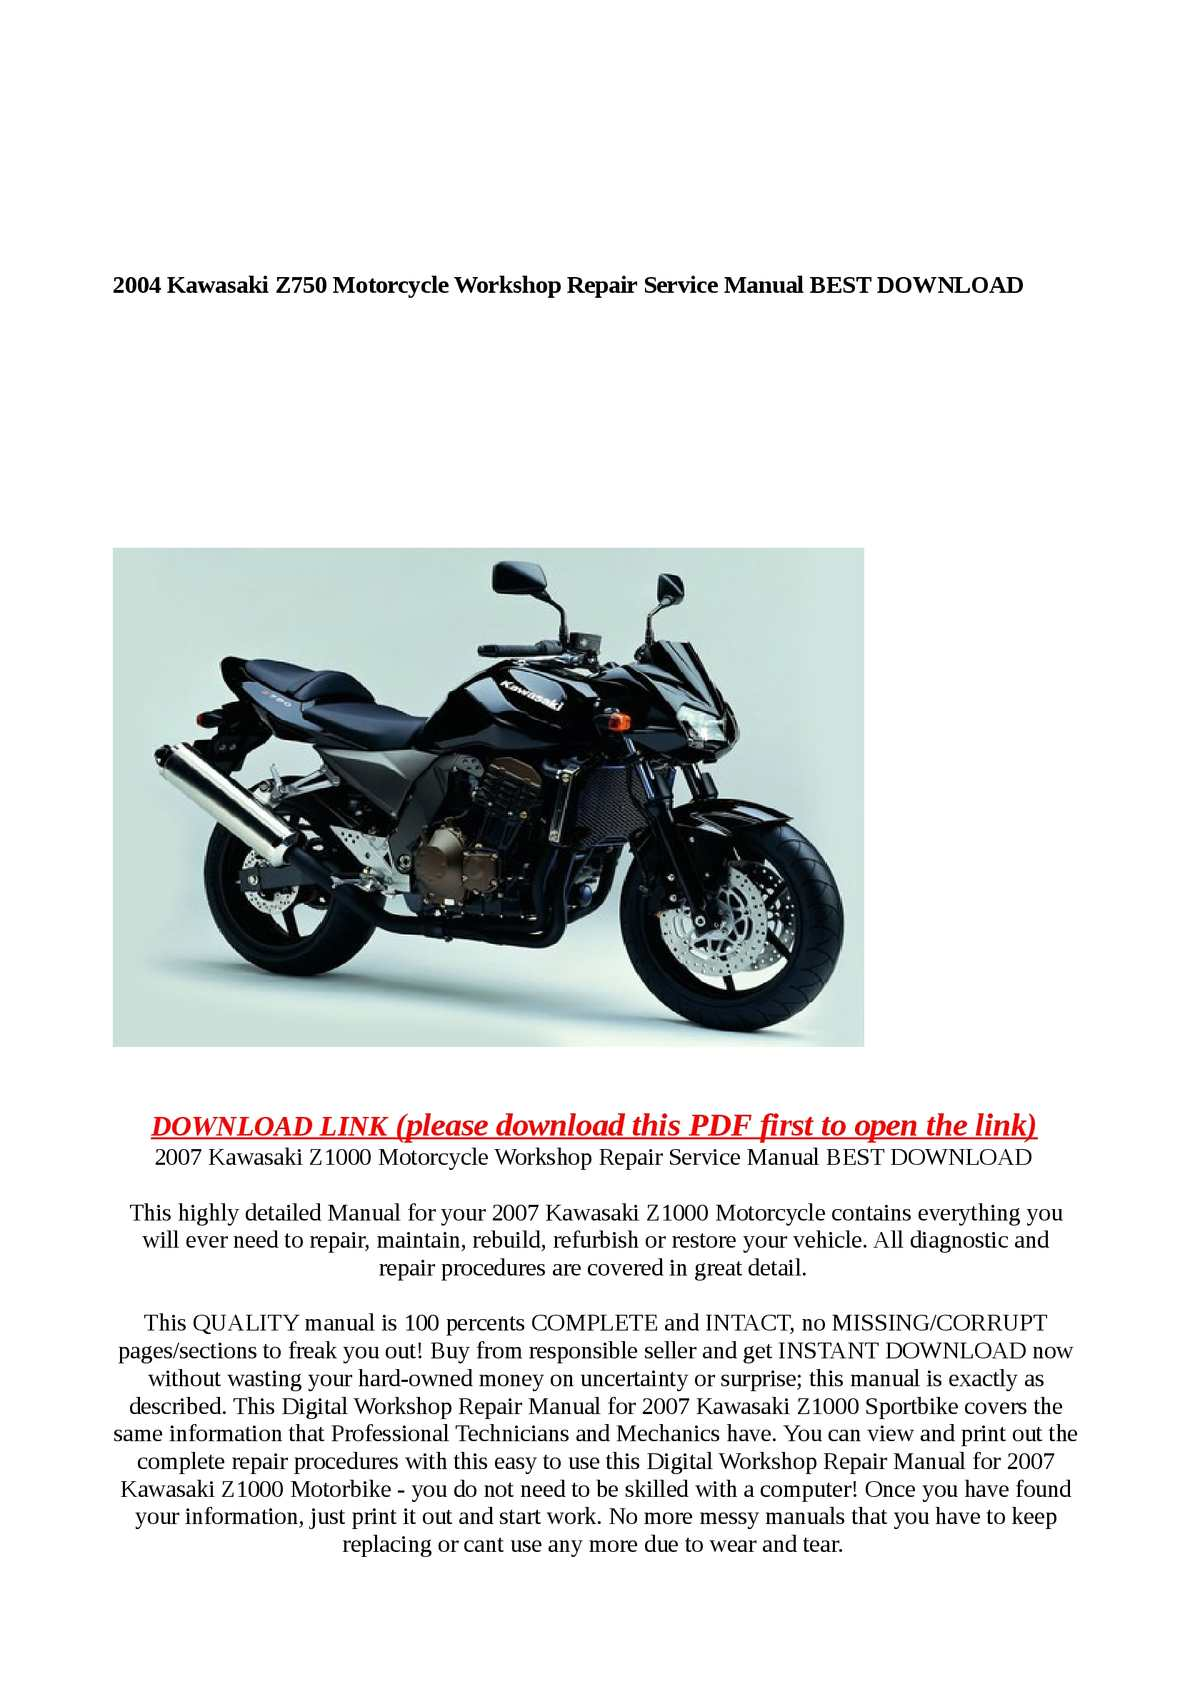 Calaméo - 2004 Kawasaki Z750 Motorcycle Workshop Repair Service Manual BEST  DOWNLOAD